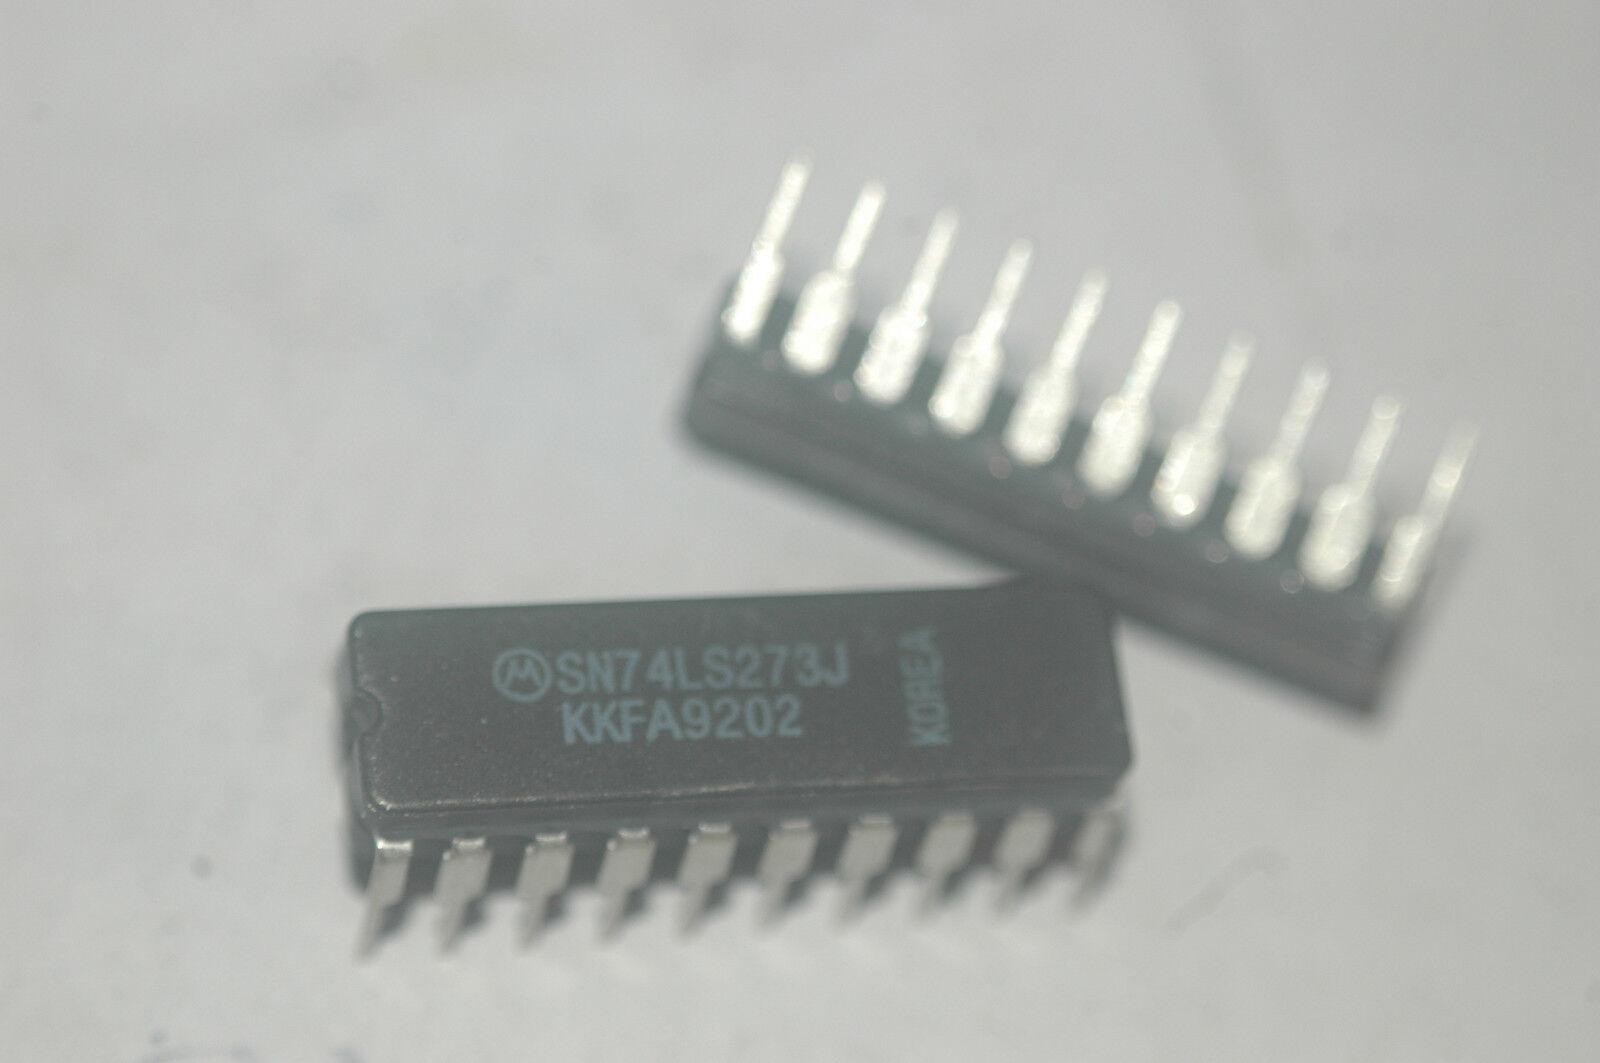 Motorola Sn74ls273j 20 Pin Ceramic Dip Integrated Circuit 18 Ebay Lm358 Dip8 Norton Secured Powered By Verisign